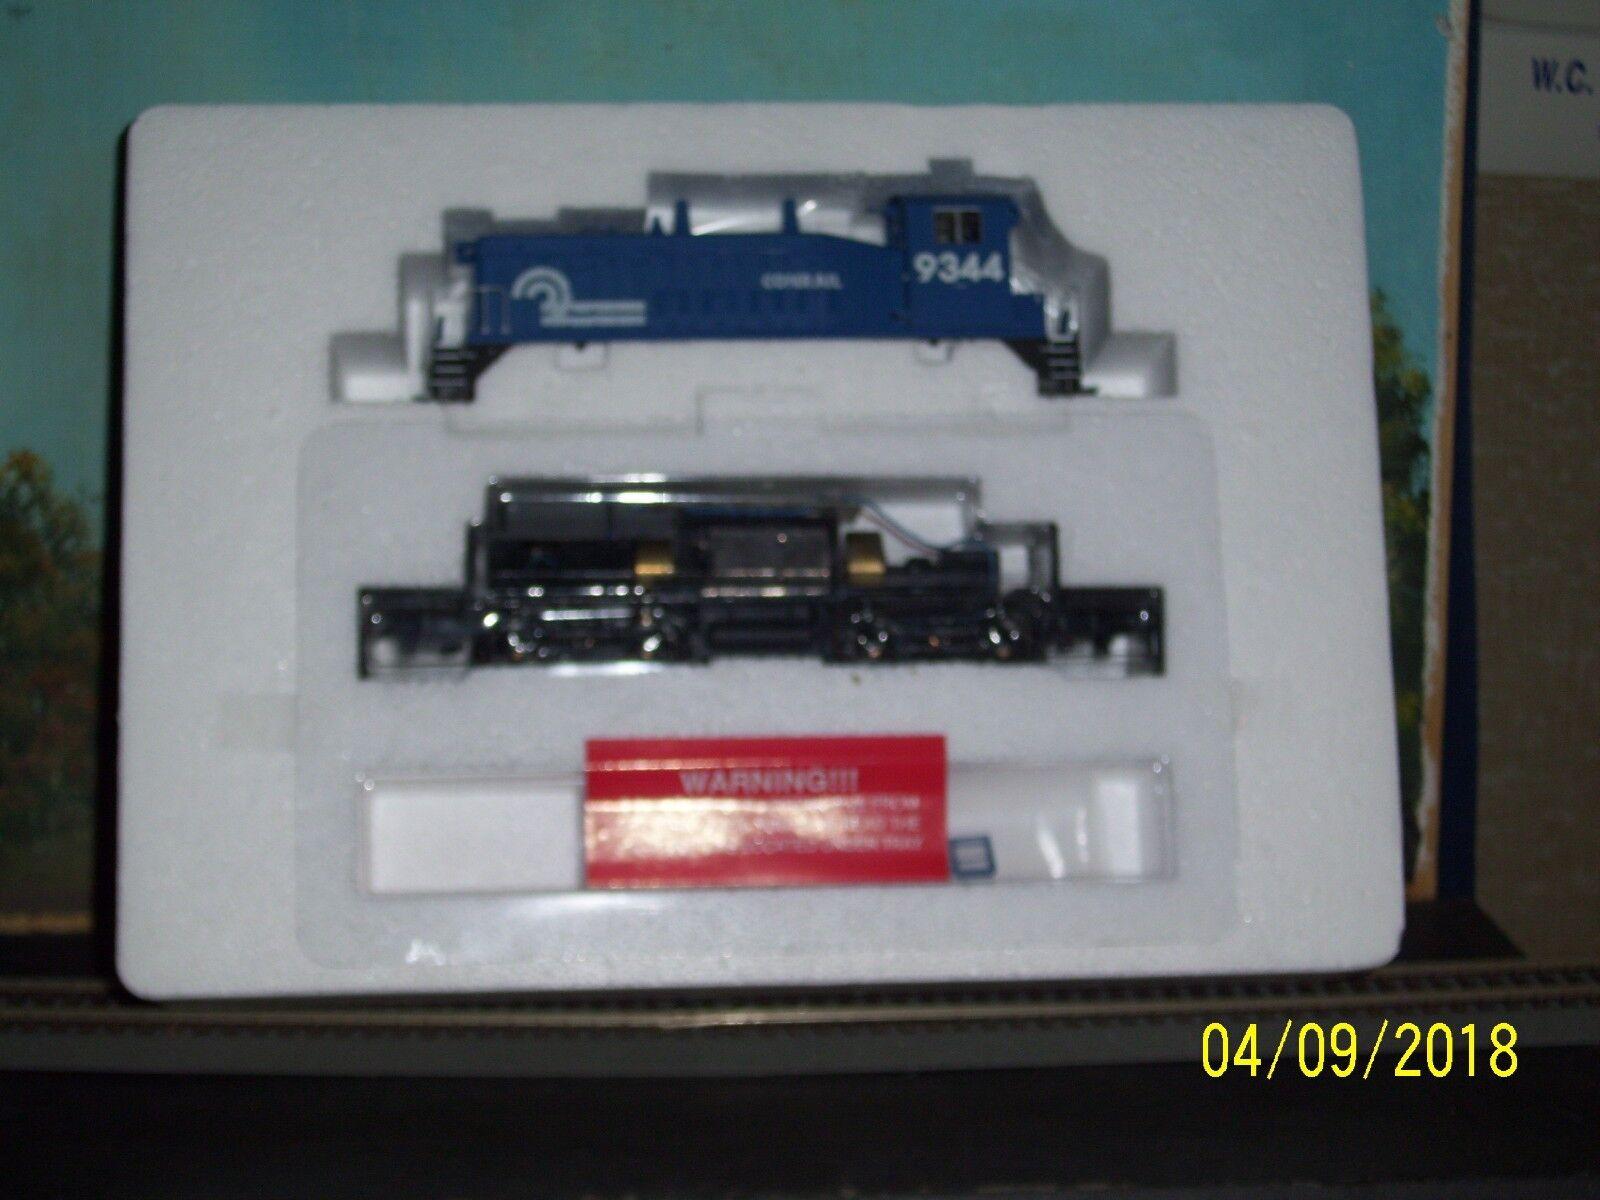 PredO 2000 HO SCALE  61 SW9 1200 CONRAIL  9344 POWERED